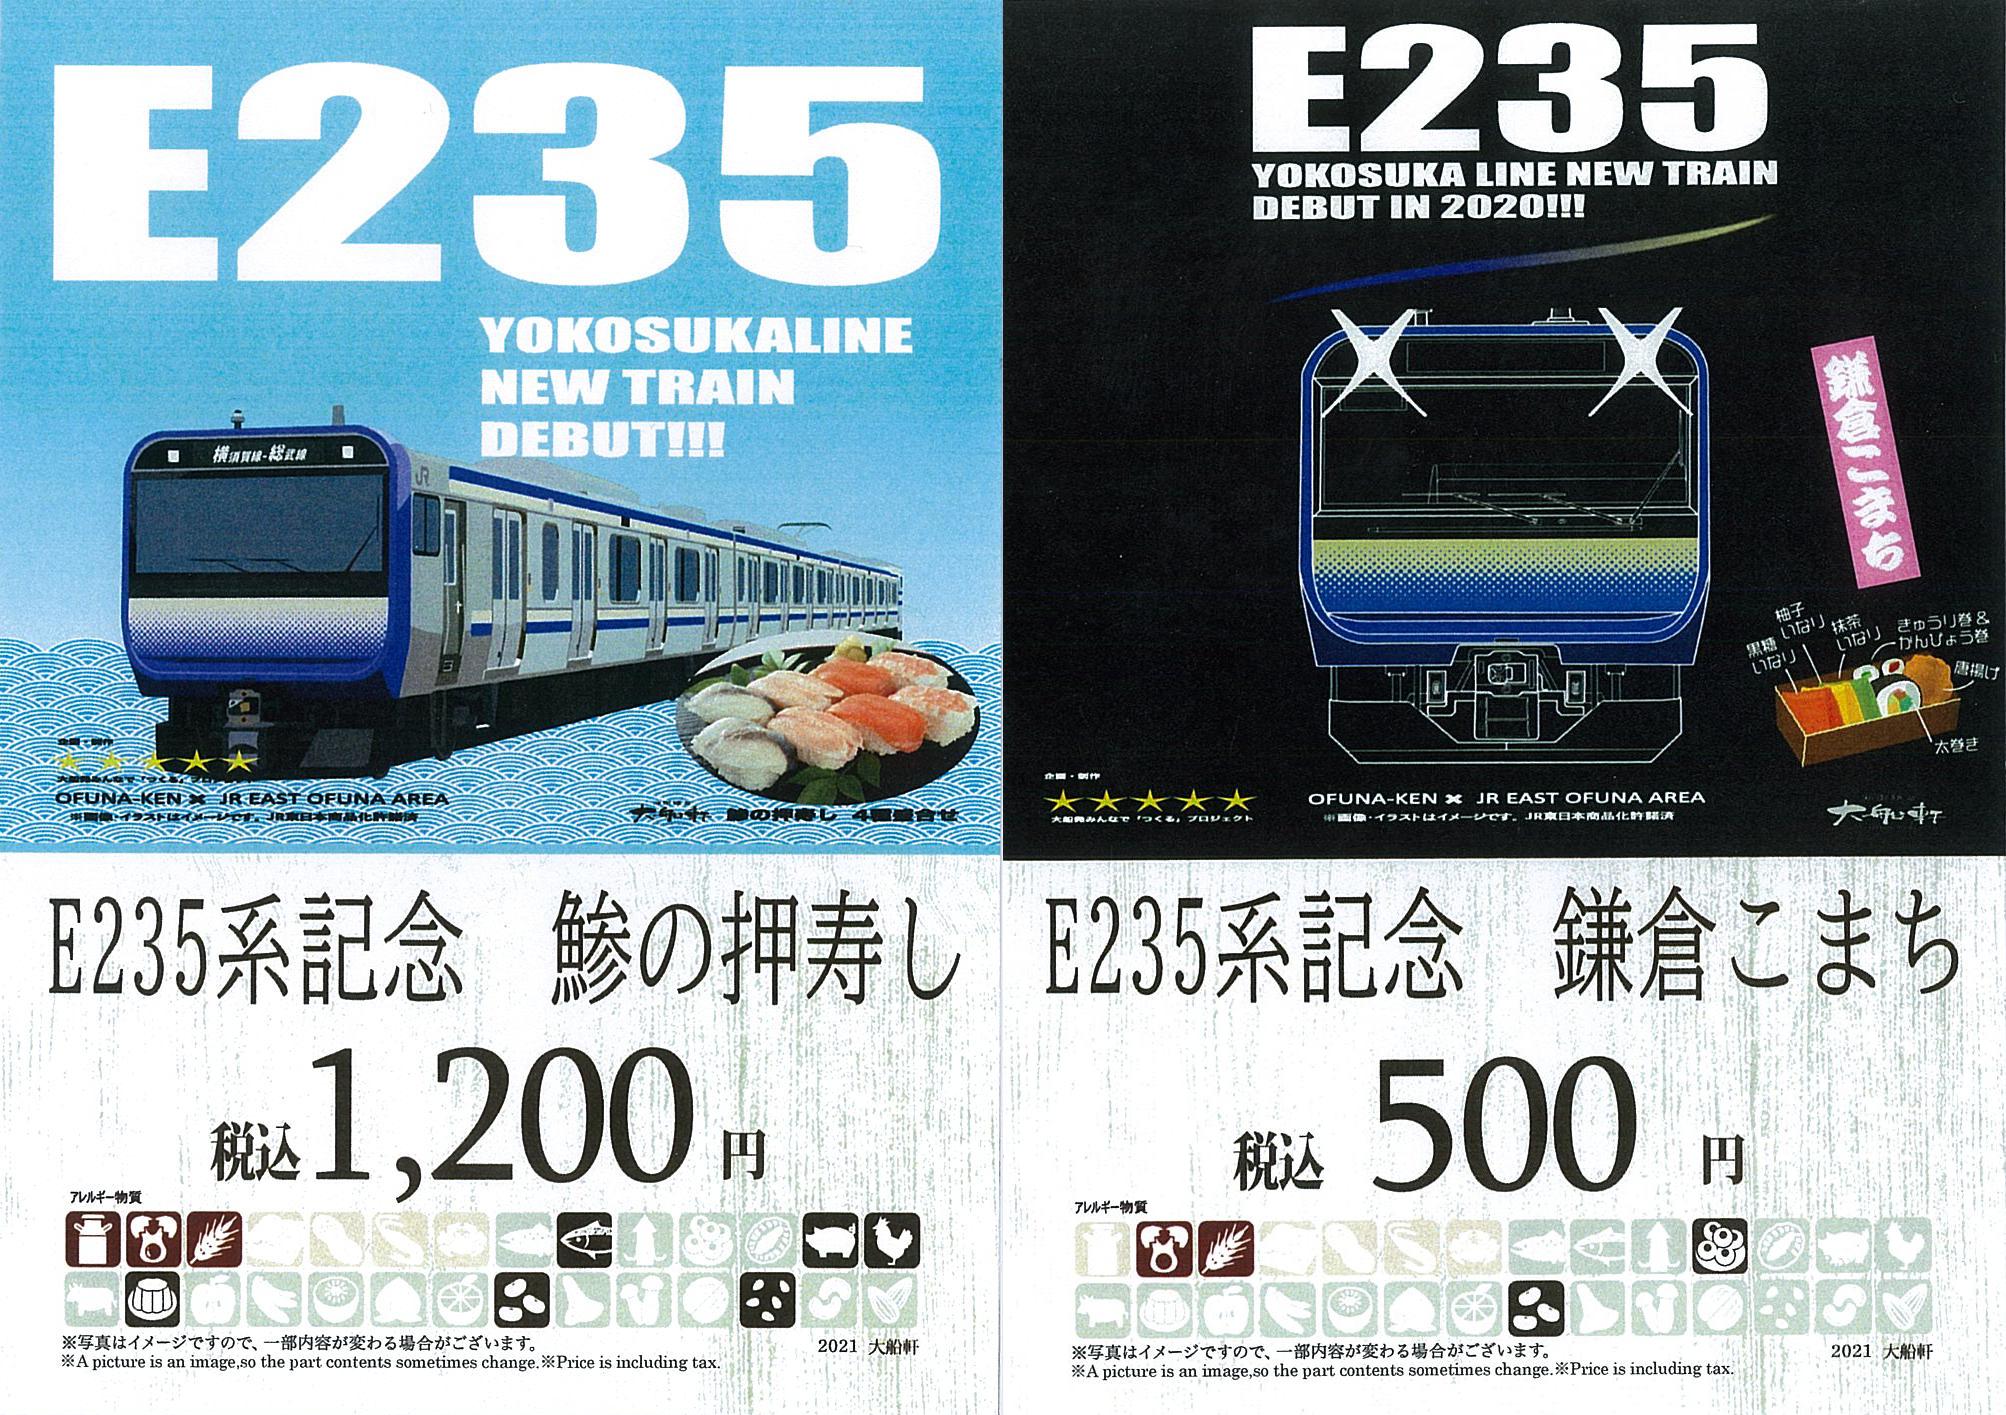 E235系記念弁当販売のお知らせ